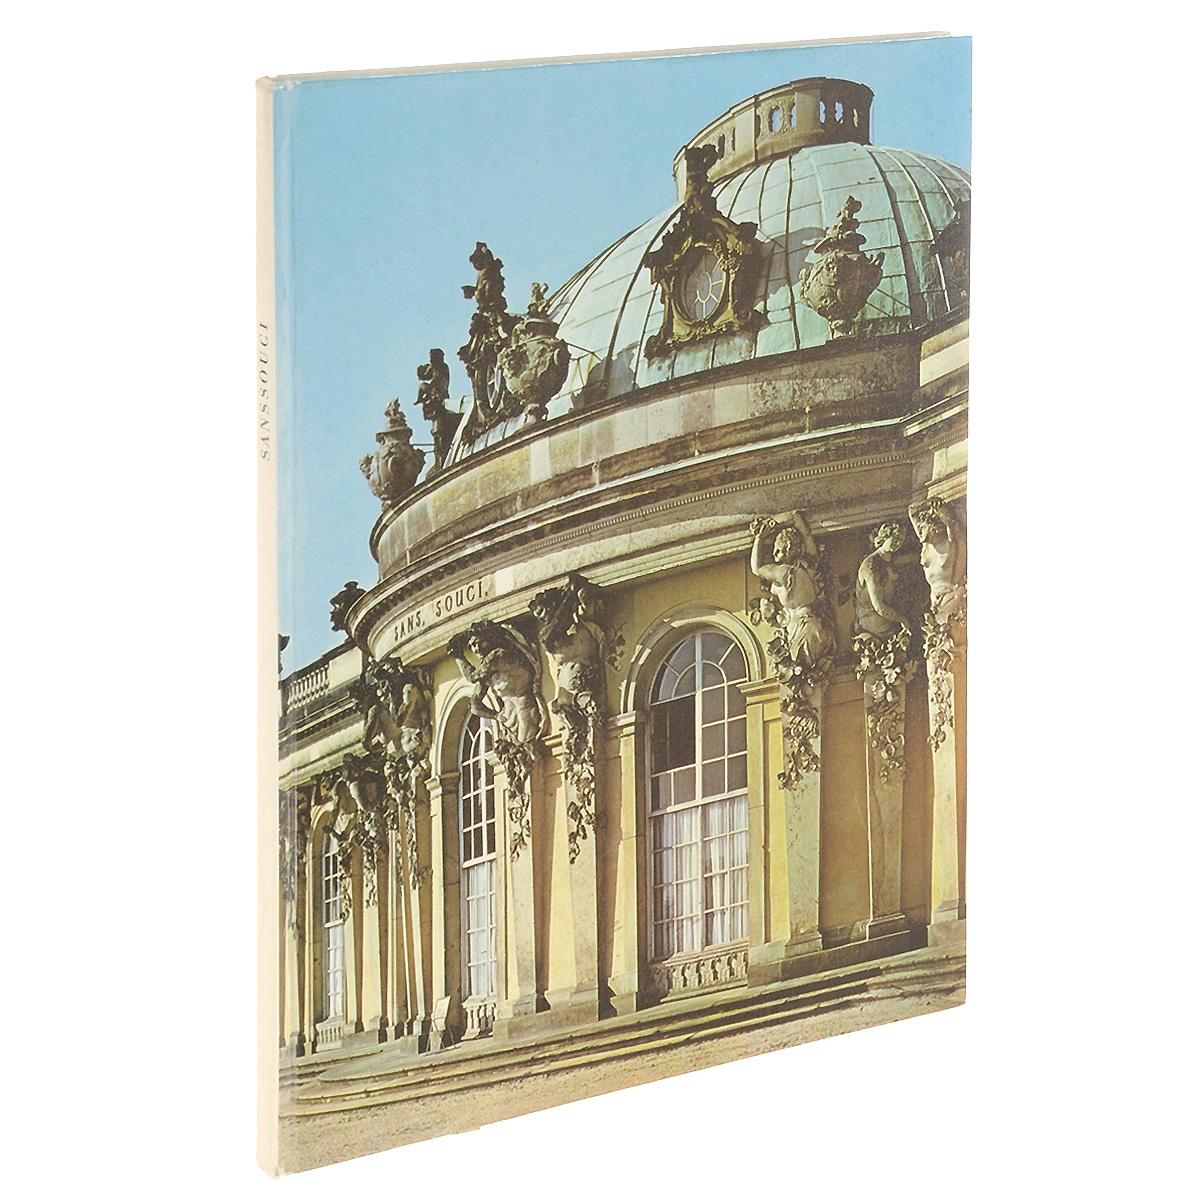 Sanssouci: Schlosser Garten Kunstwerke sanssouci schlosser garten kunstwerke